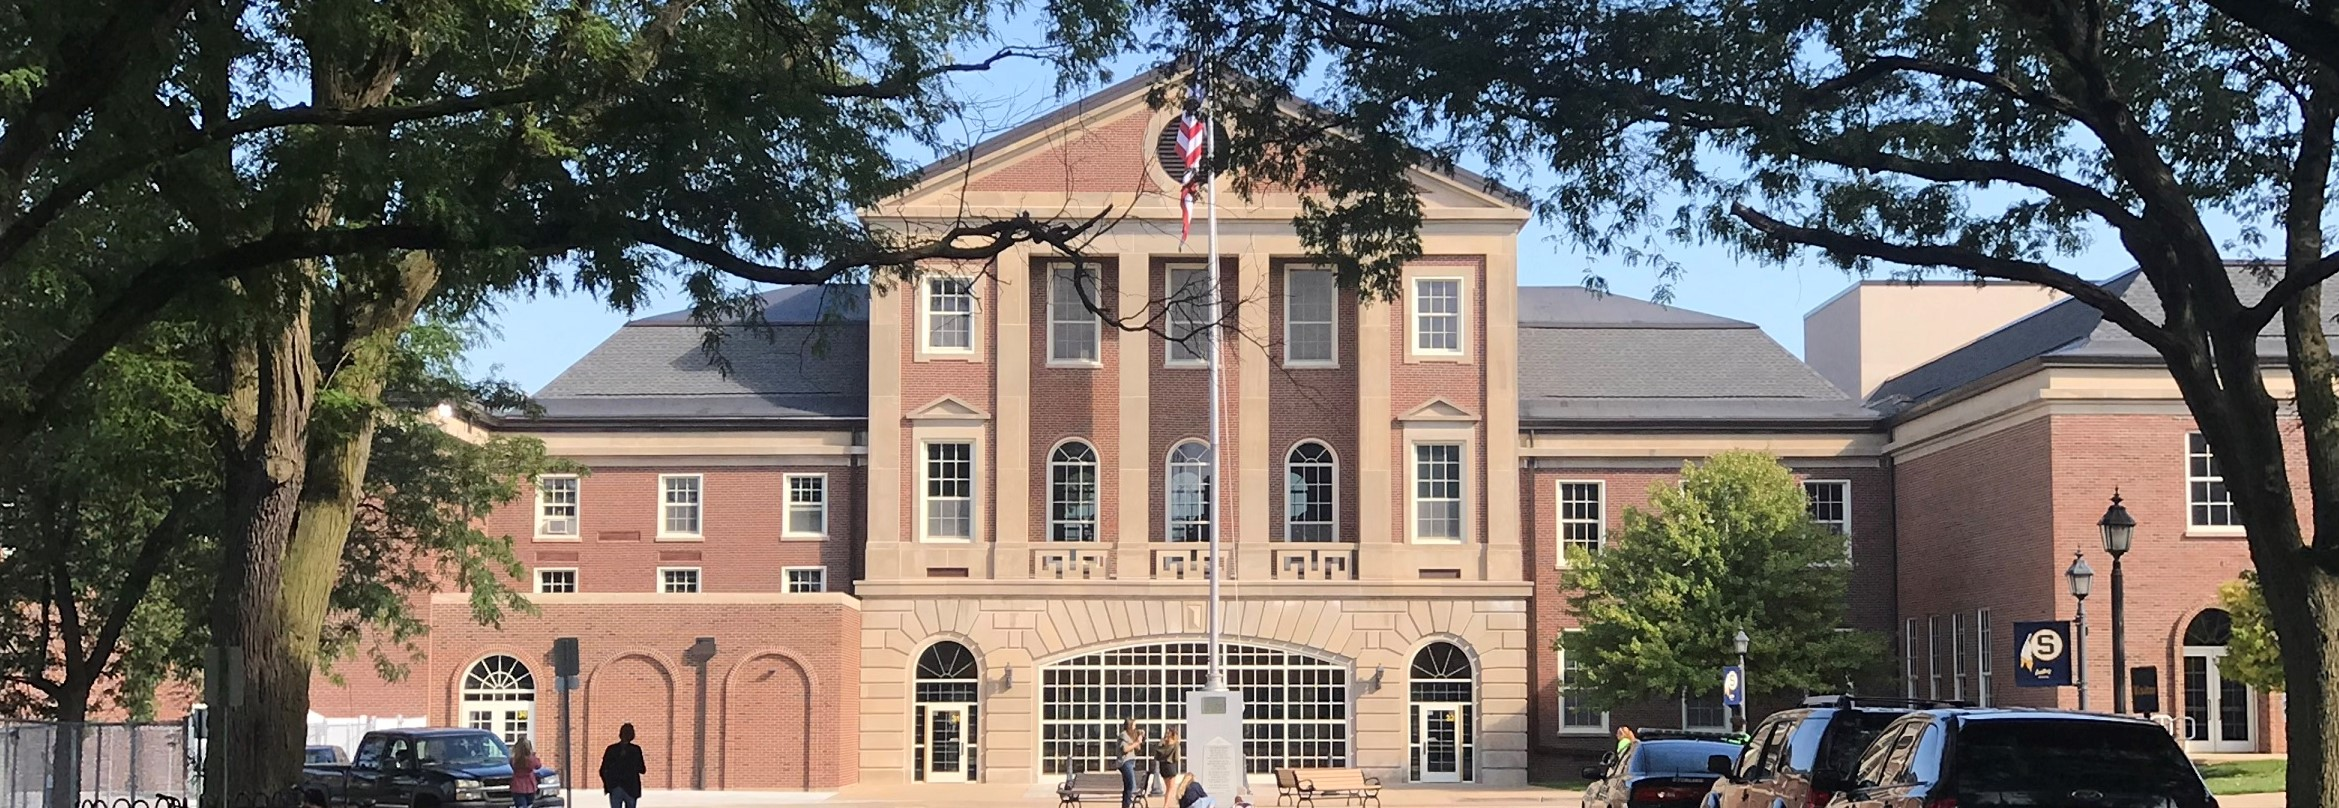 Sterling High School Image